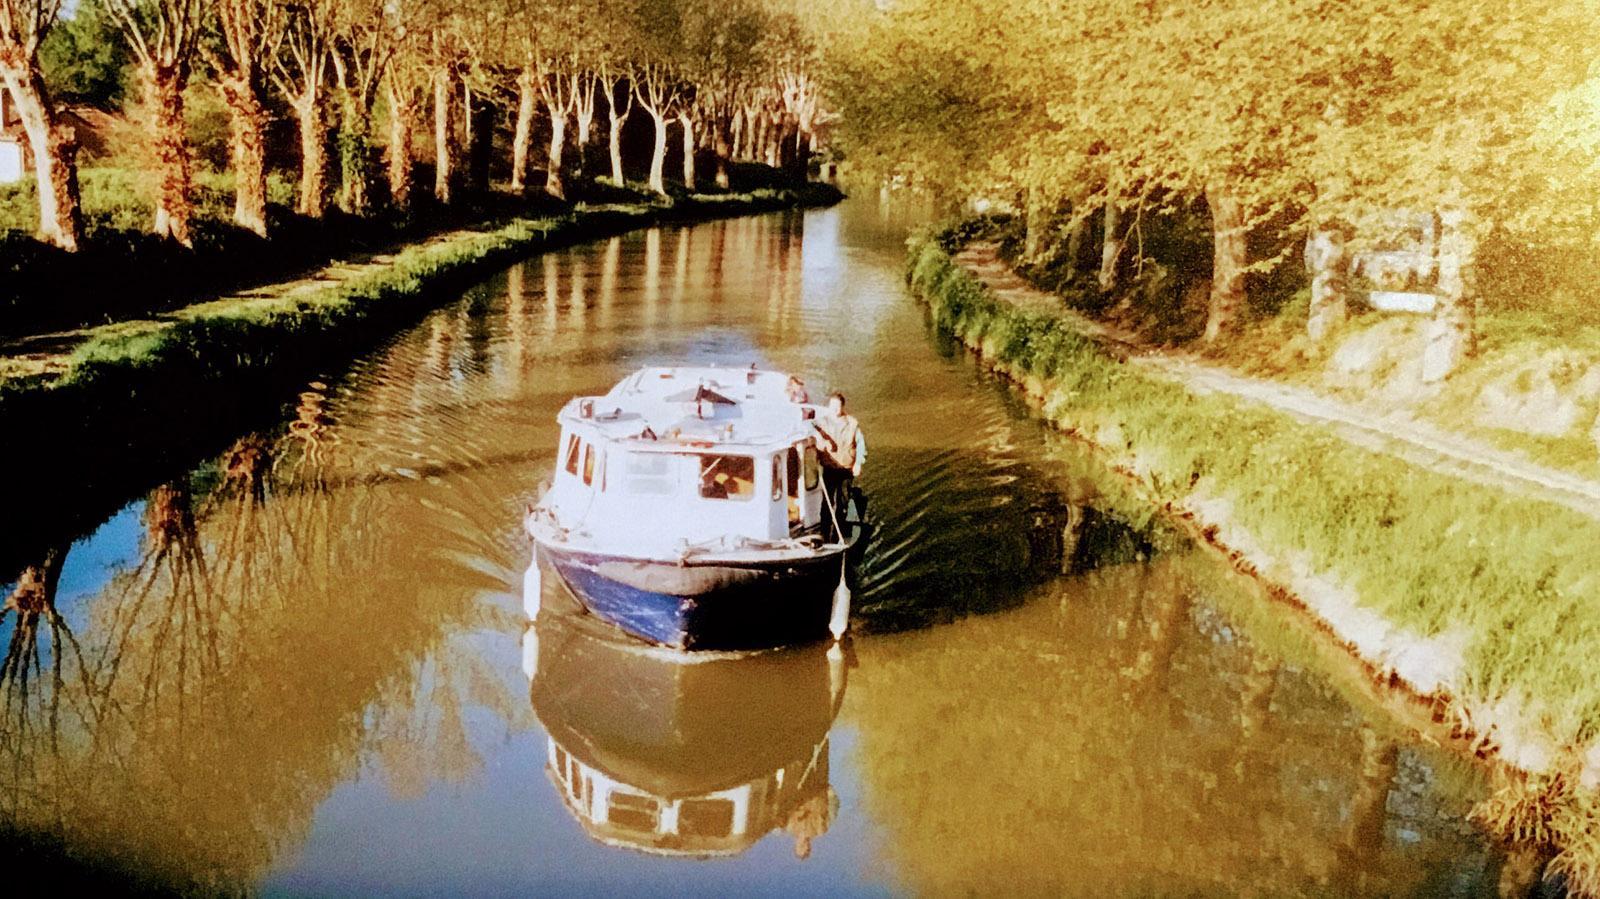 Mein Boot auf dem Canal du Midi. Foto: Leonore Ander ?